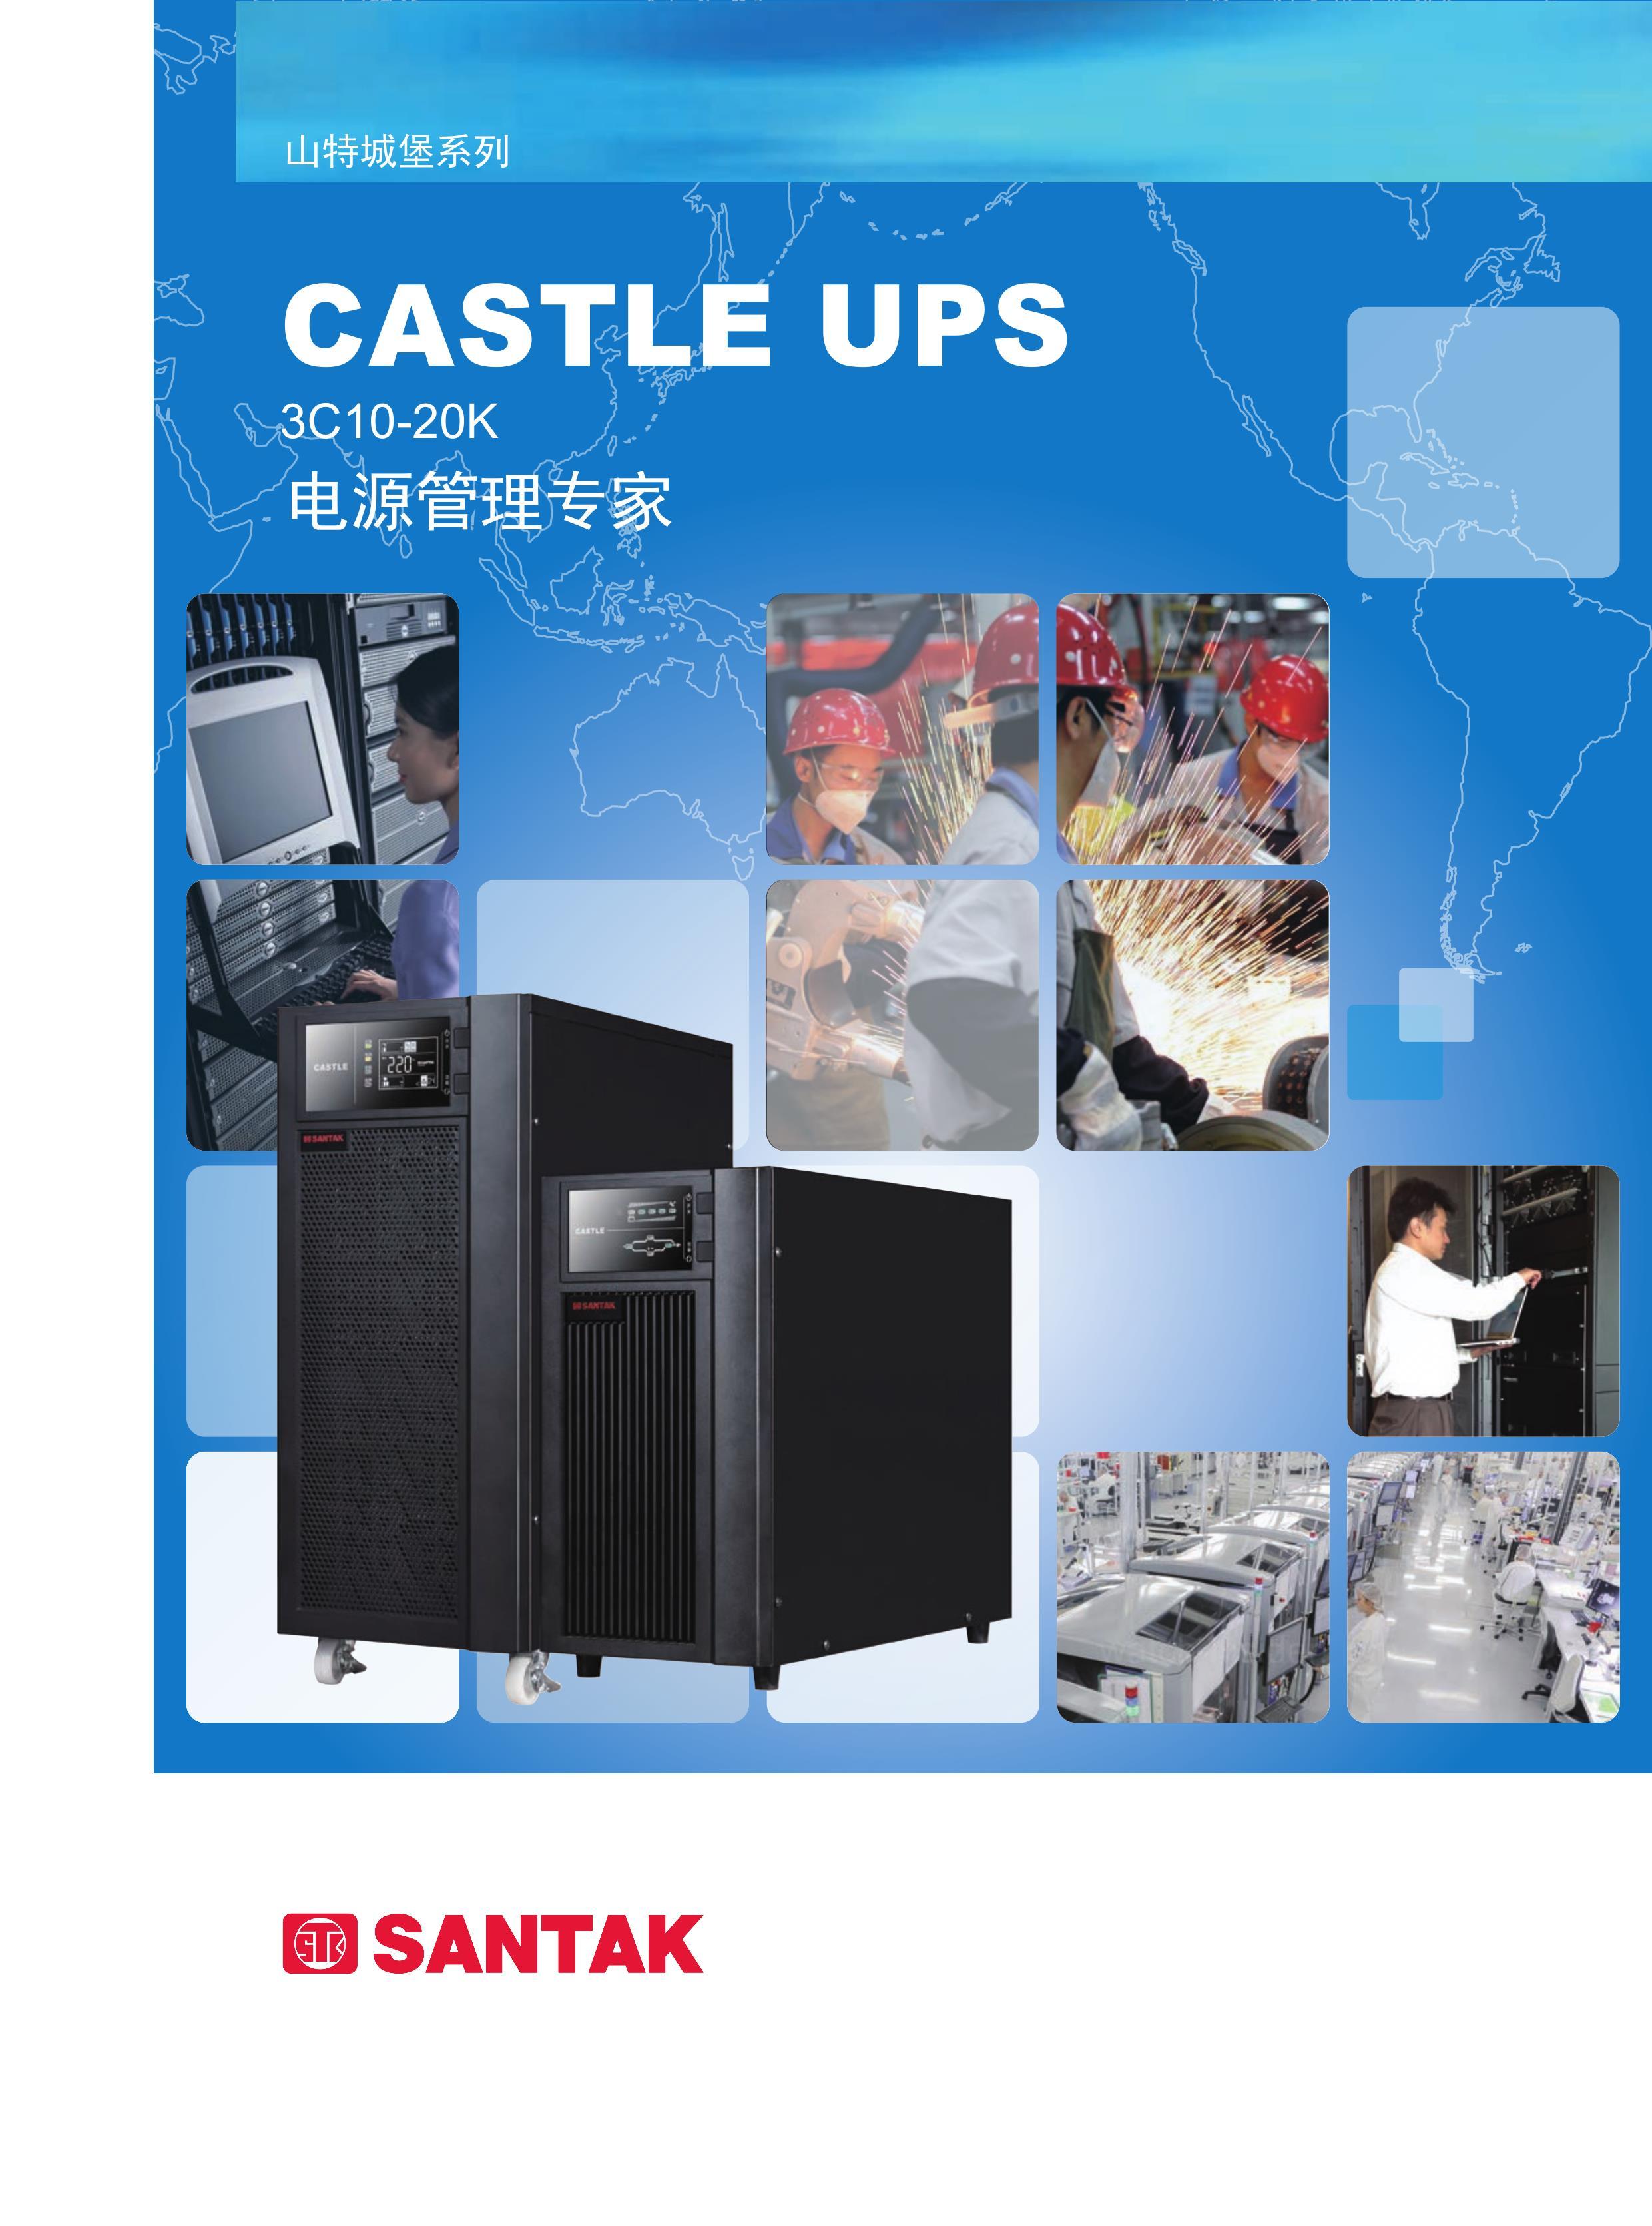 山特3C10-20KVA系列UPS